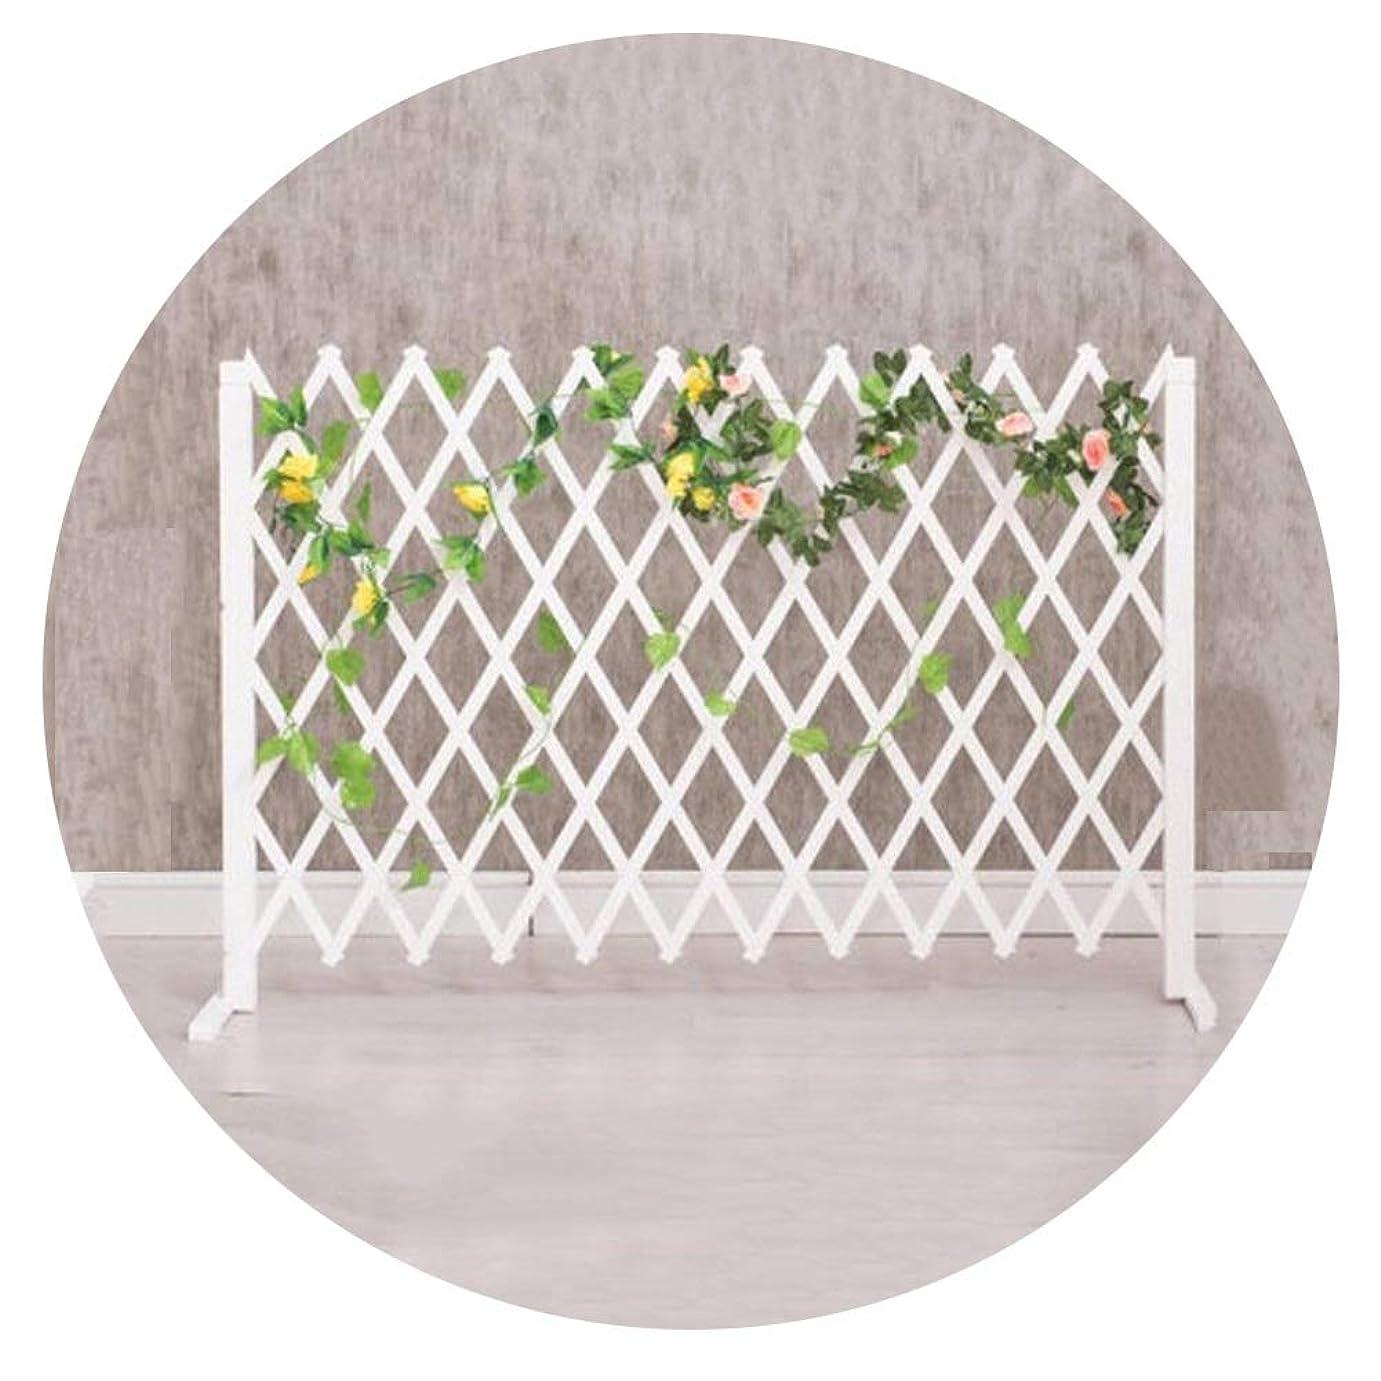 YYFANG 木製フェンス屋内および屋外の仕切り小F防食プロセス耐候性含浸ローズ植物クライミングフレーム、2色、4サイズ (Color : White, Size : 160x75cm)